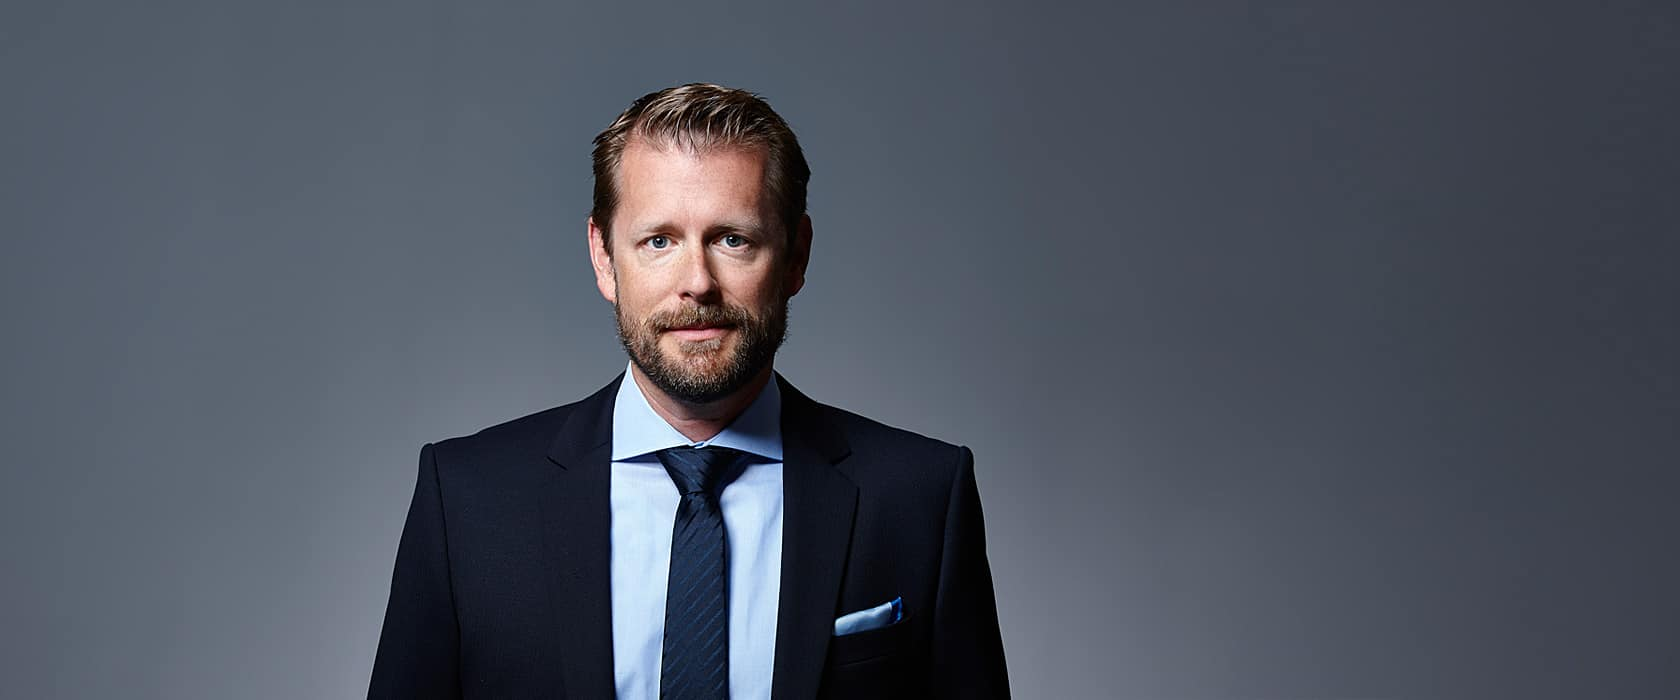 Jens Klaus Fusbahn | Rechtsanwalt der Kanzlei Kötz Fusbahn